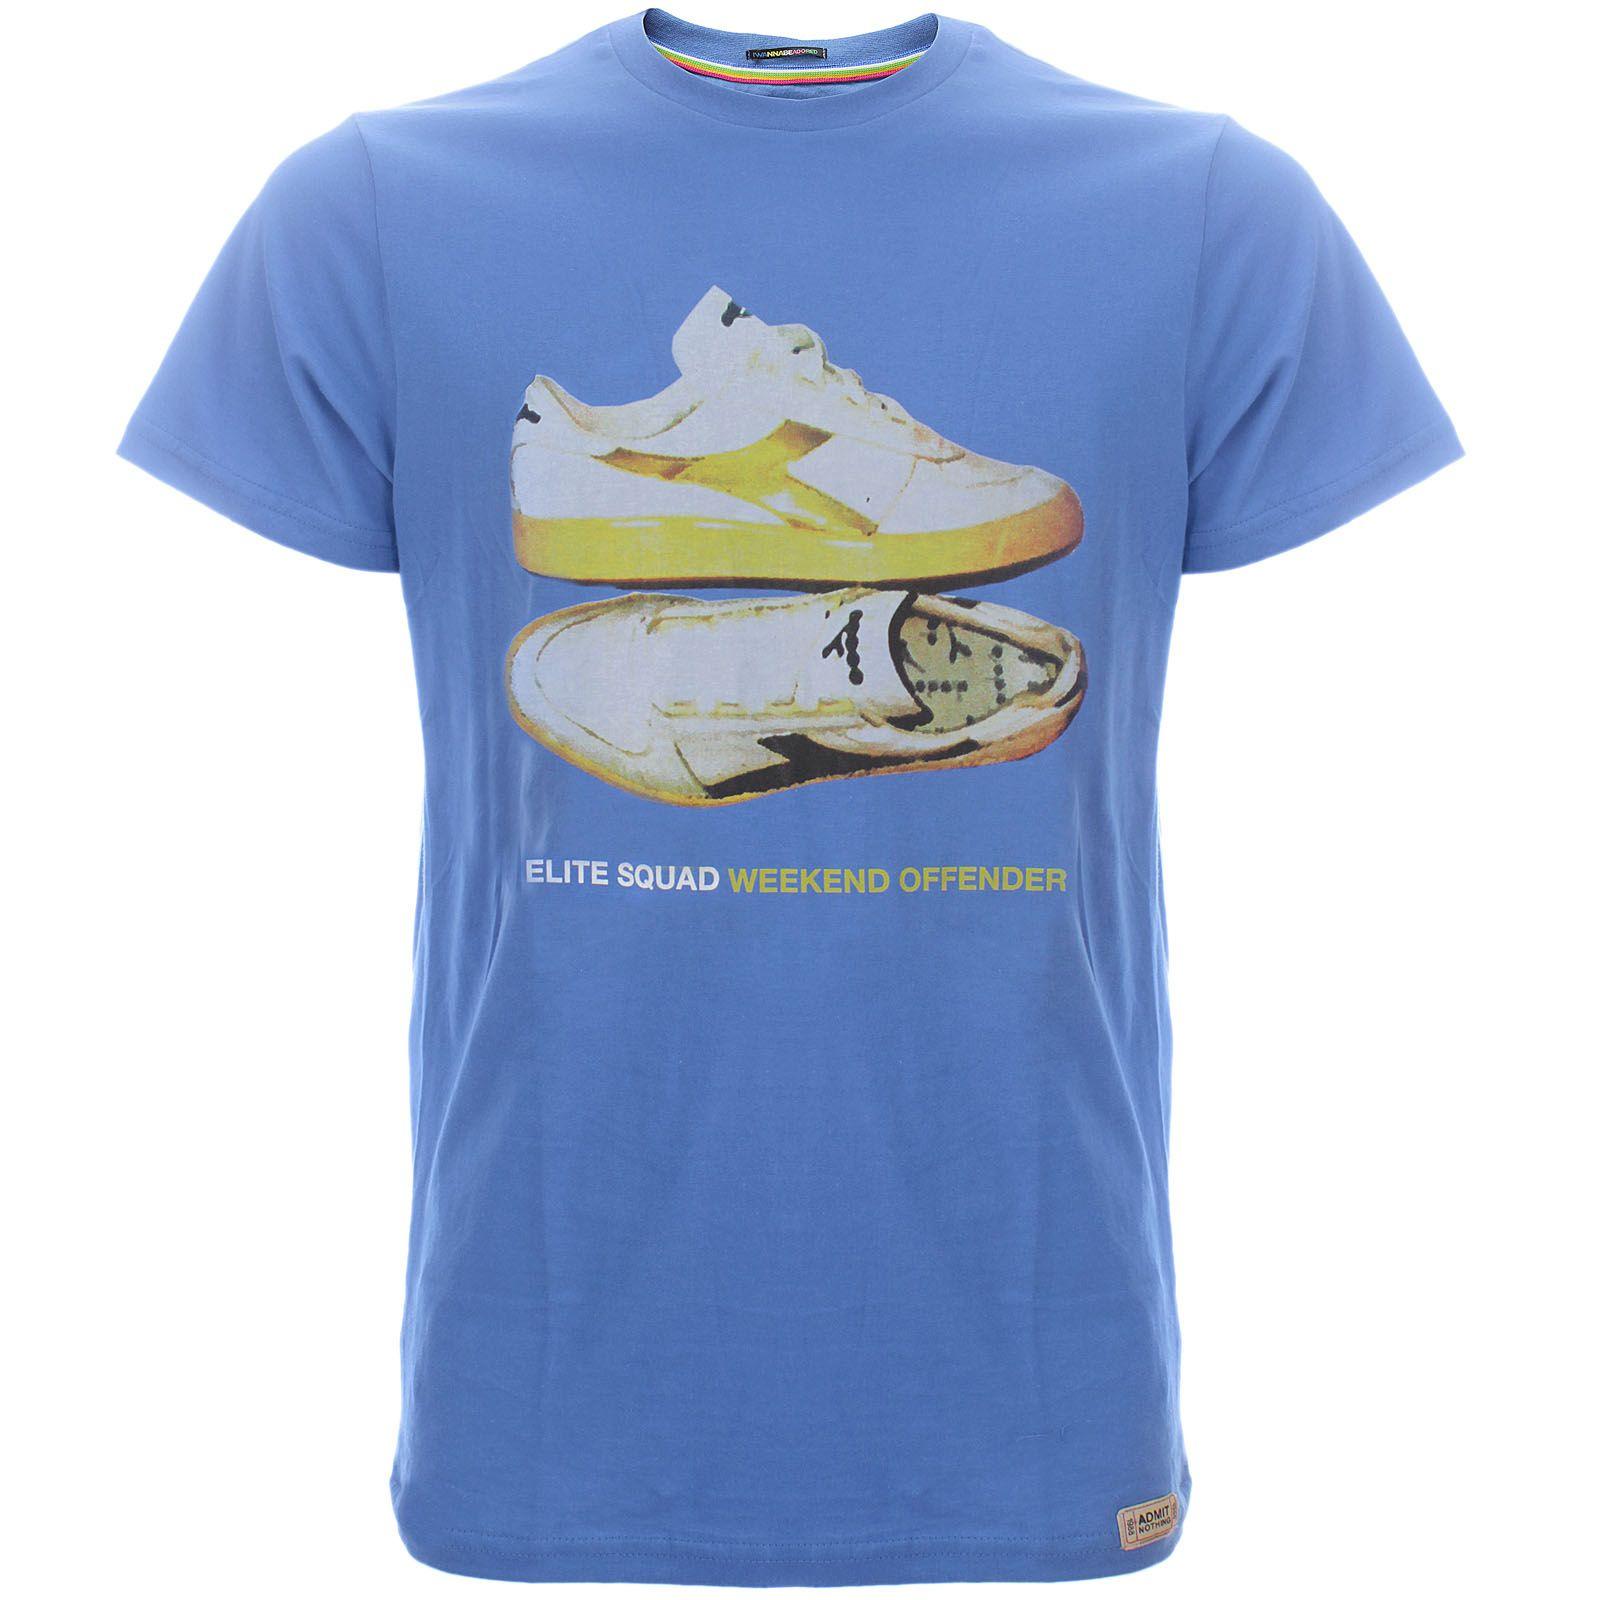 3807b6ece13749 WEEKEND OFFENDER - ELITE SQUAD T-SHIRT INTER BLUE (15346)